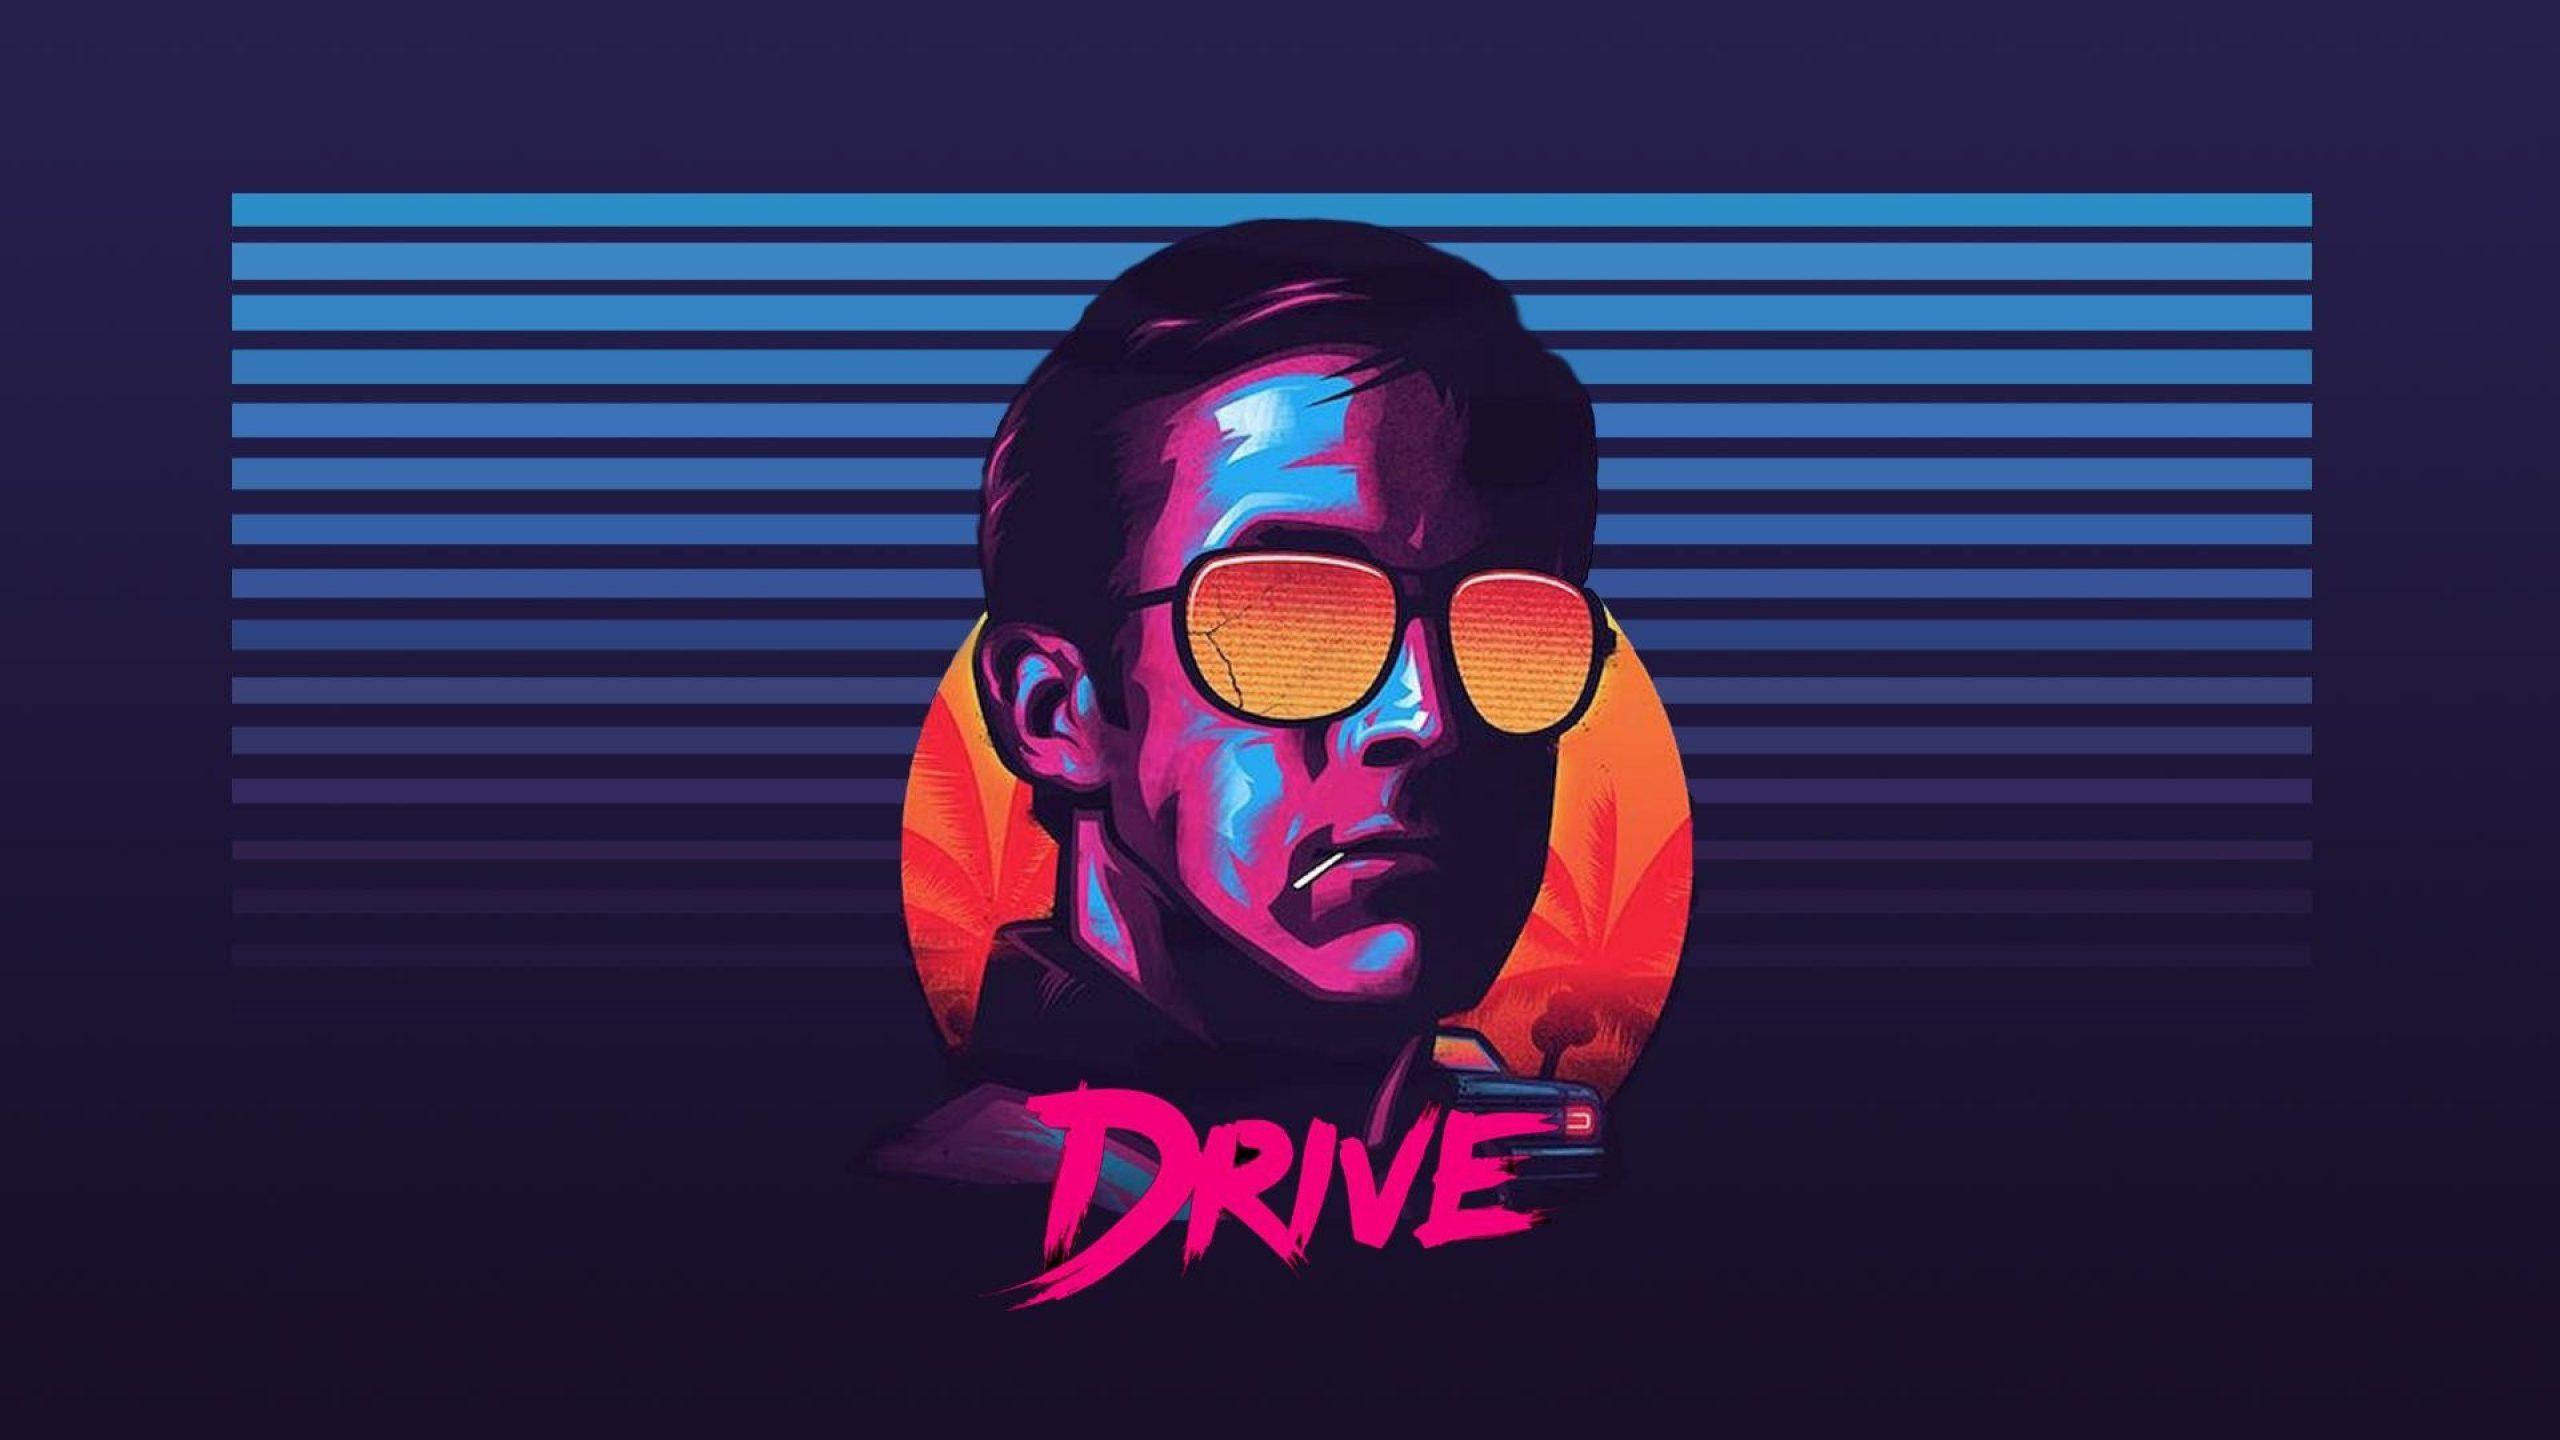 Drive Movie hd desktop wallpaper